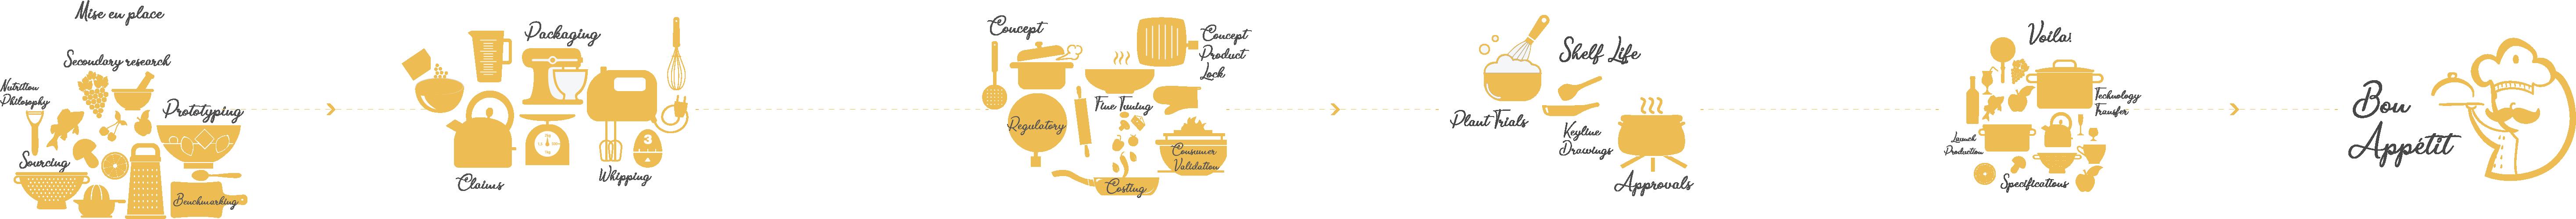 Process_v1.0